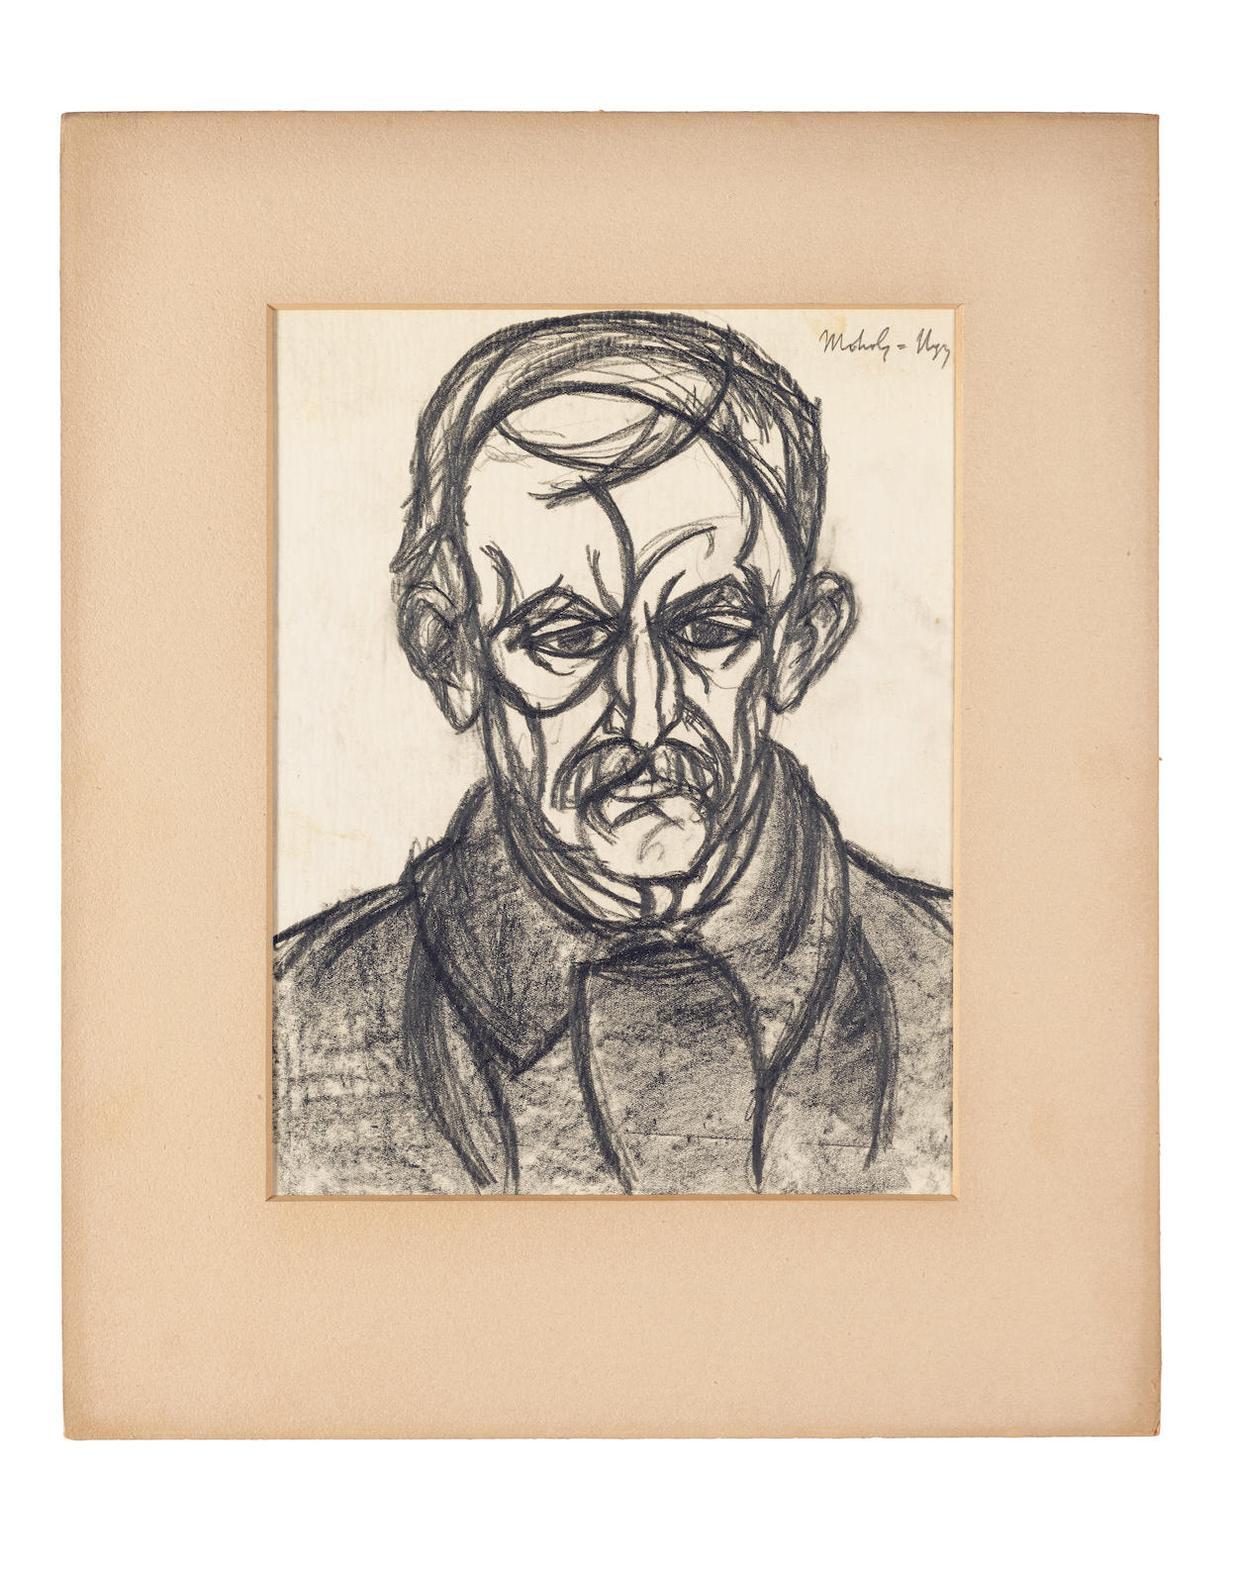 Laszlo Moholy-Nagy-Portrat Eines Mannes-1920